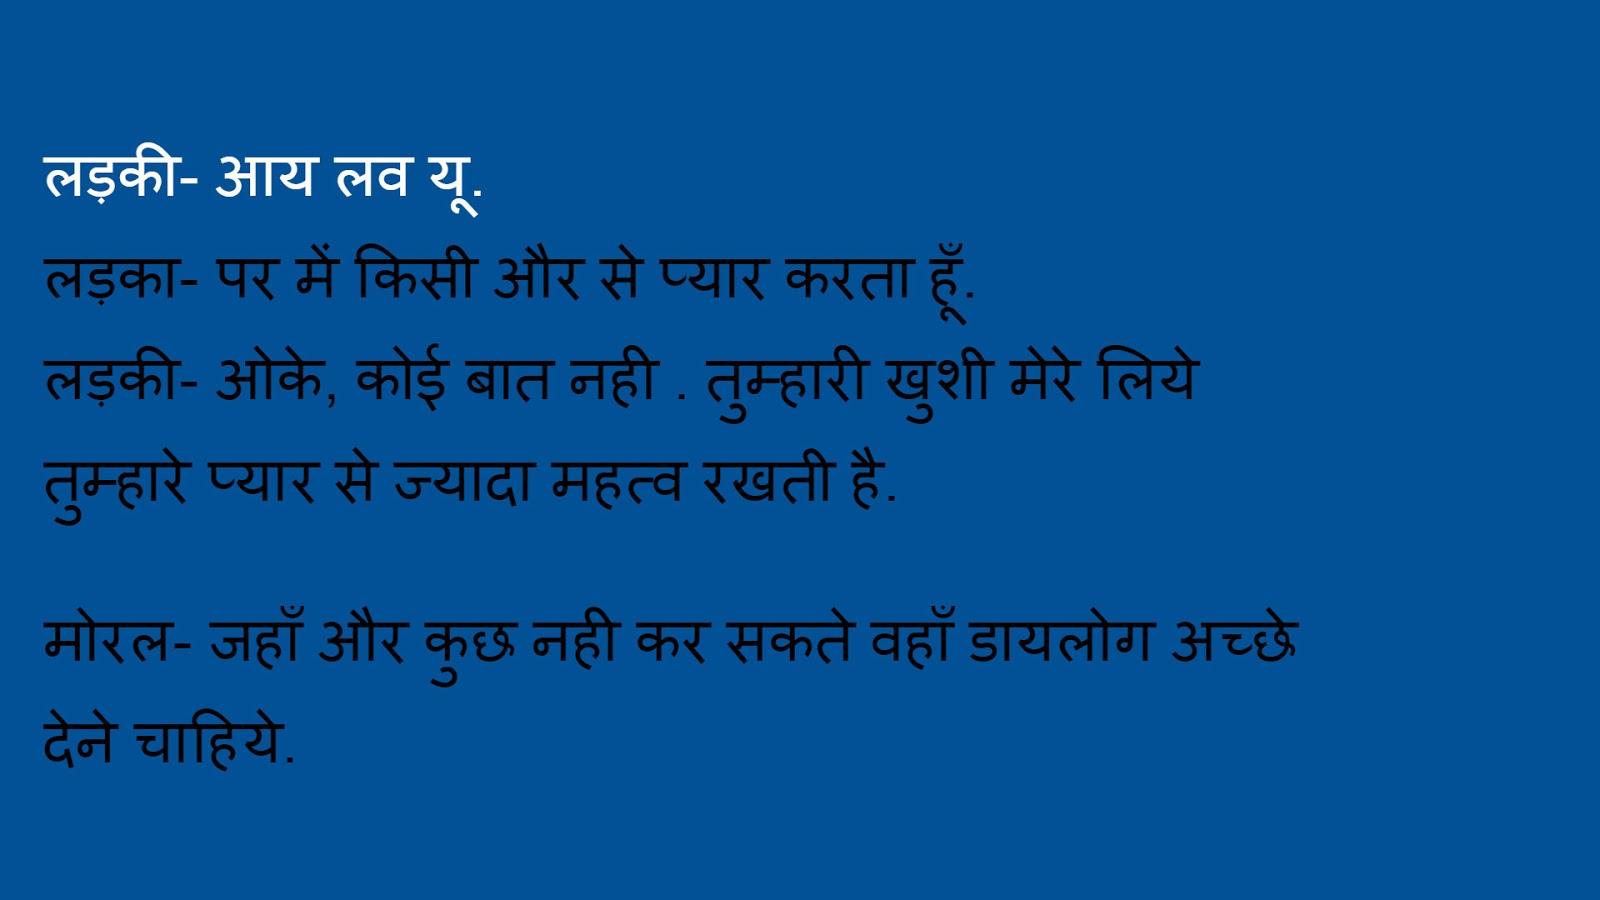 ... shayari on love,hindi love shayari,shayari love,shayari image,funny